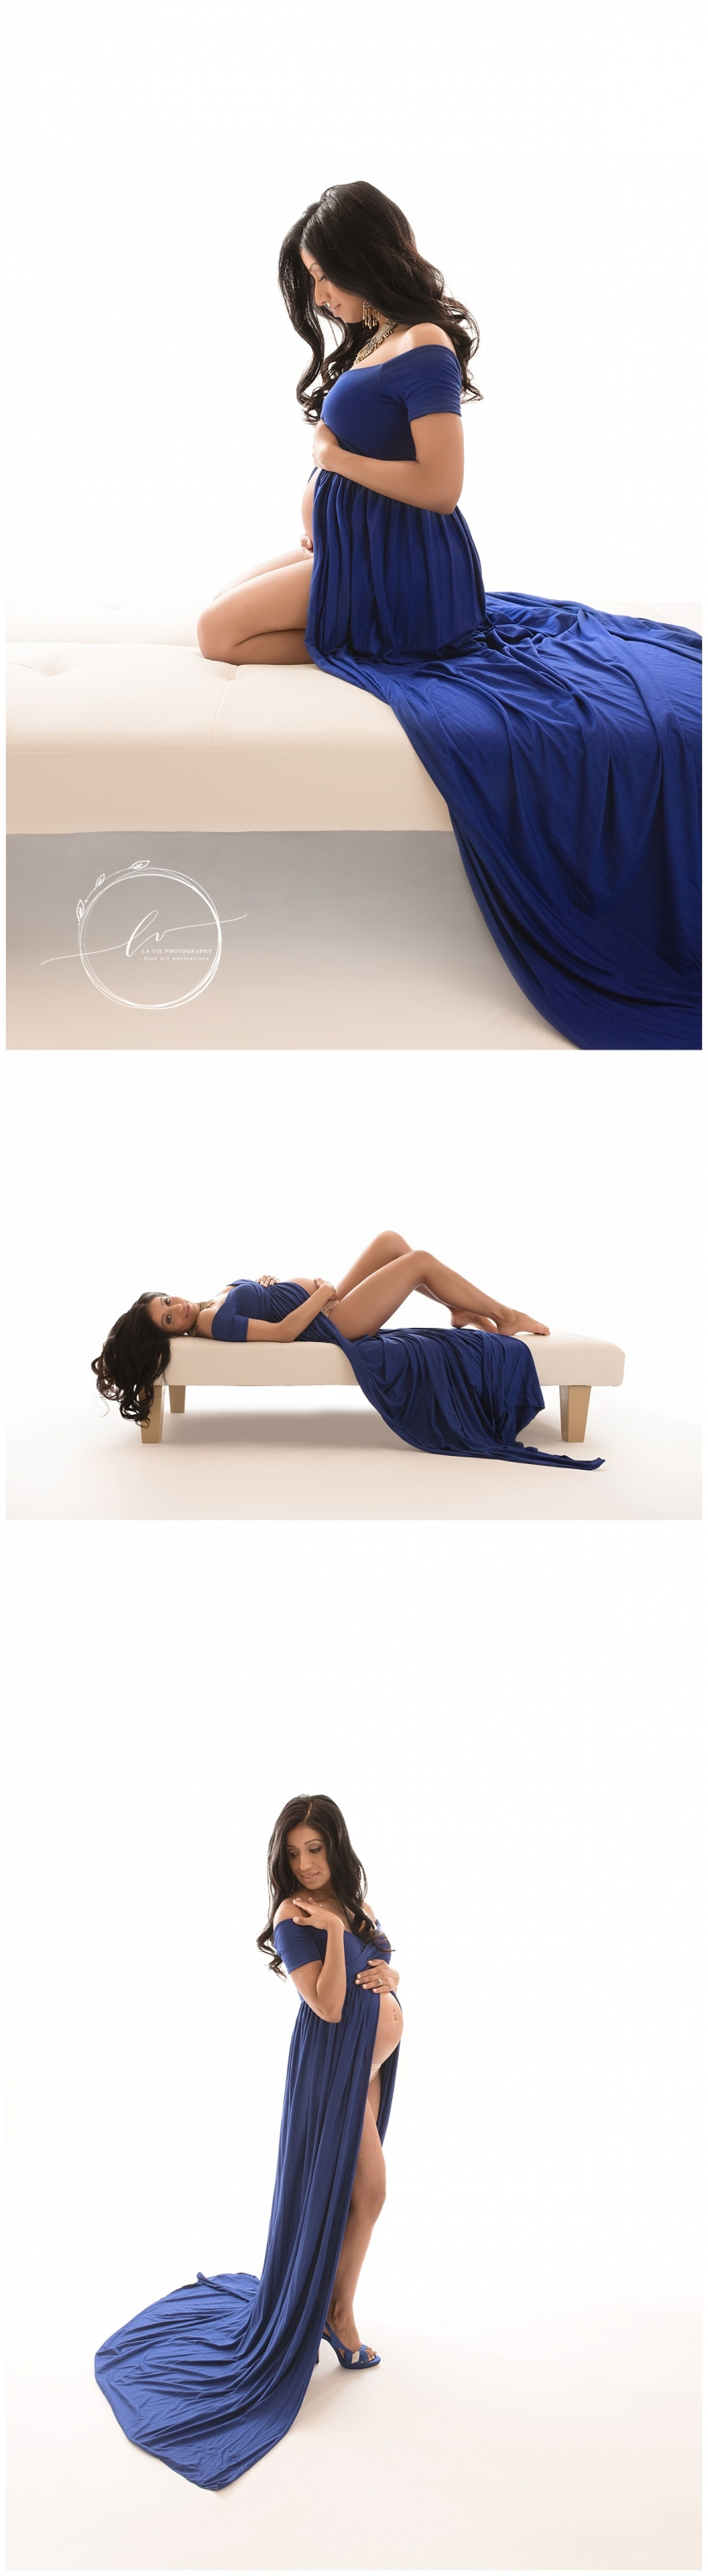 Houston Maternity Photography-La Vie Photography